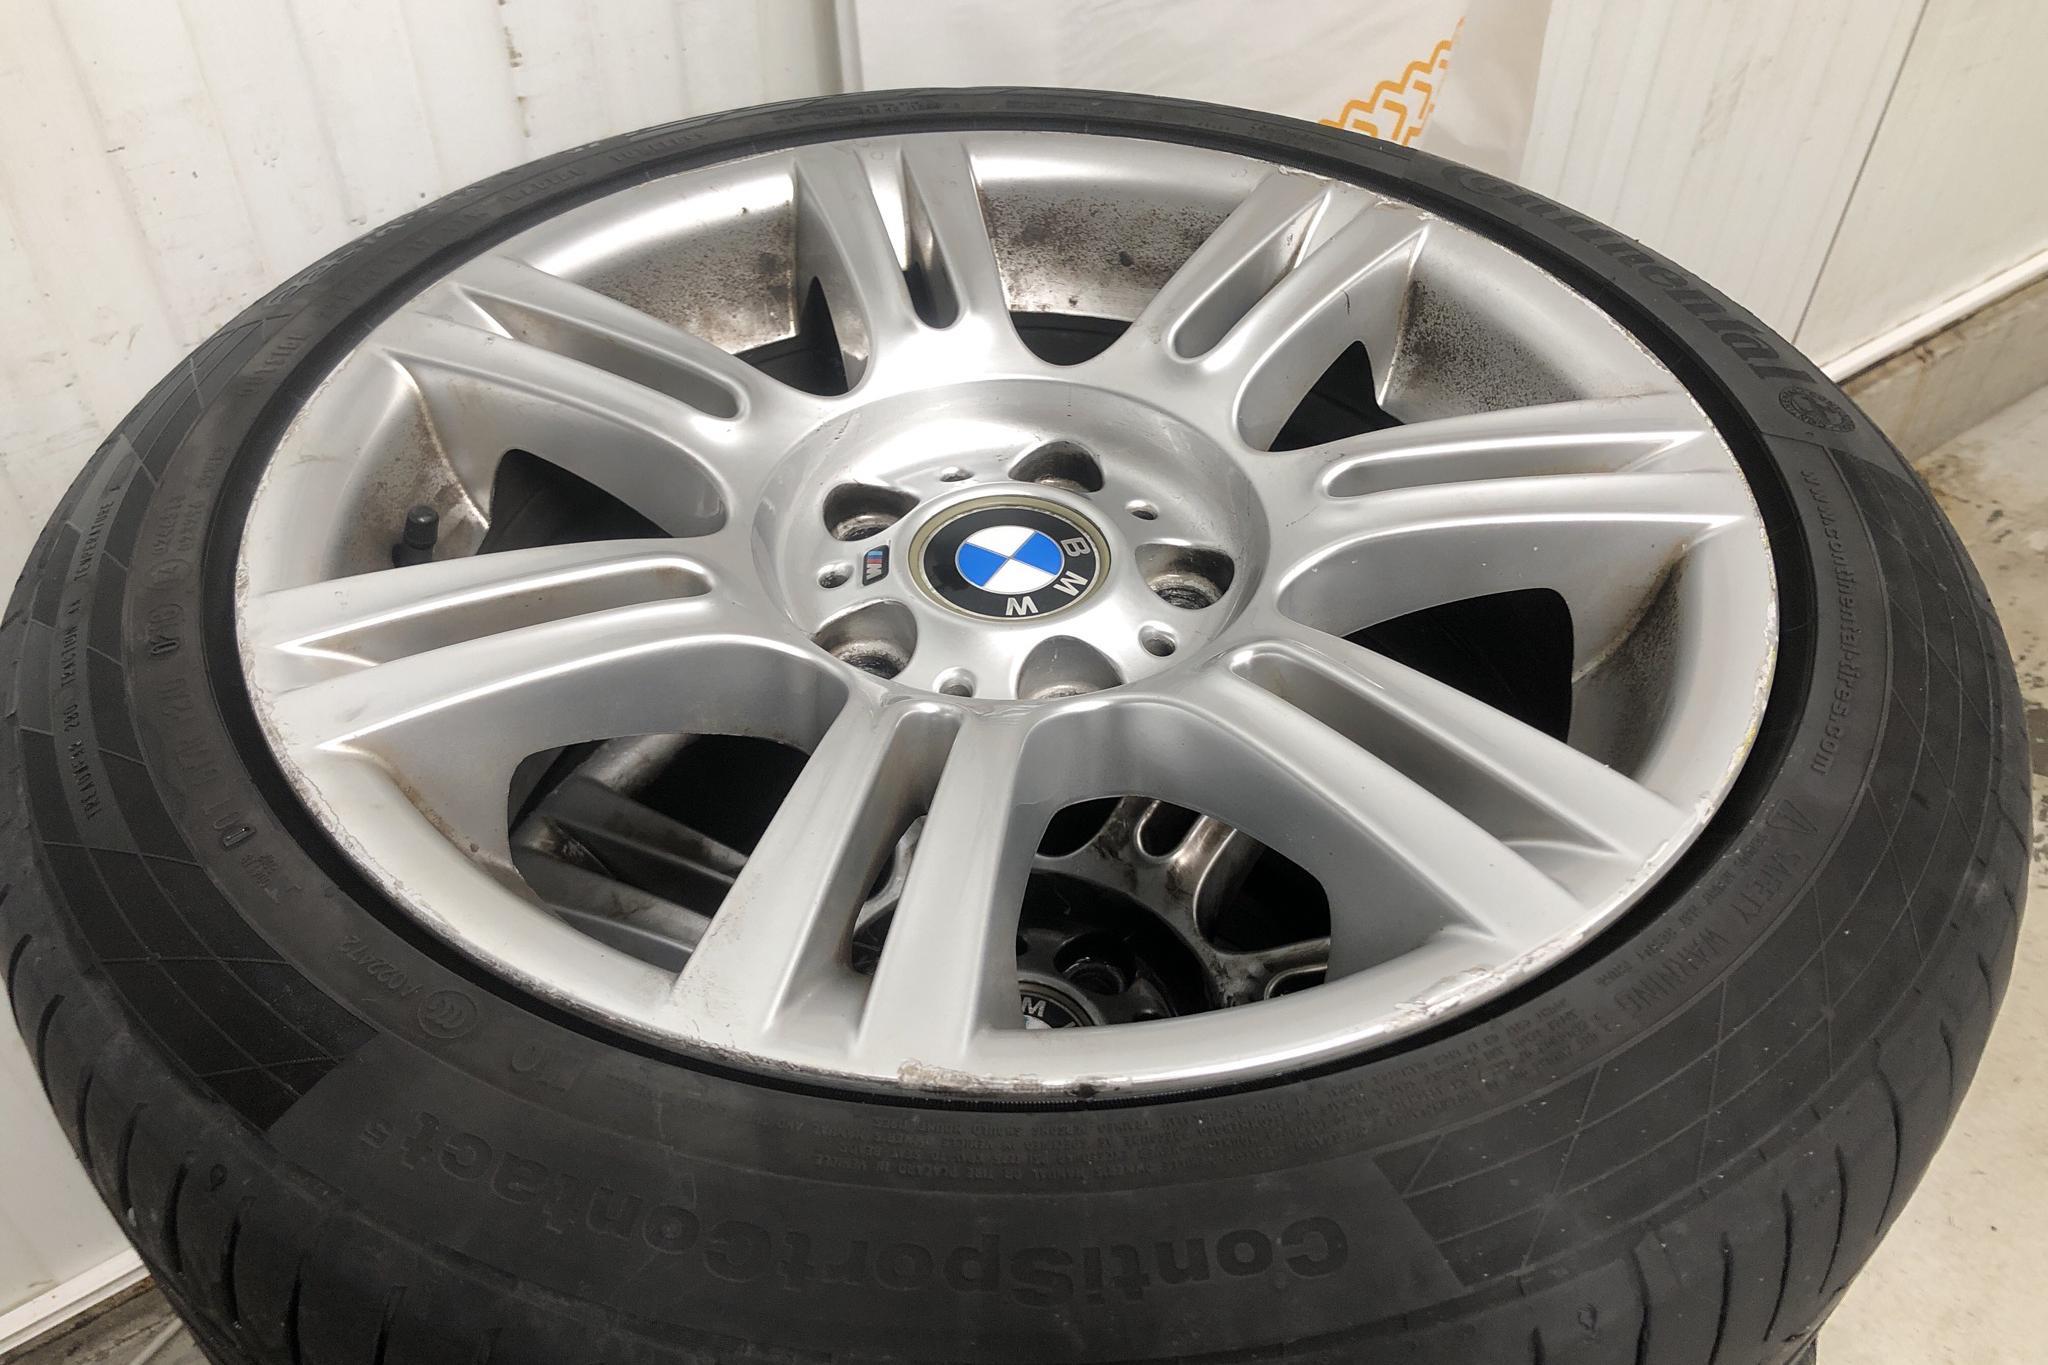 BMW 325i Touring, E91 (218hk) - 137 690 km - Automatic - blue - 2006